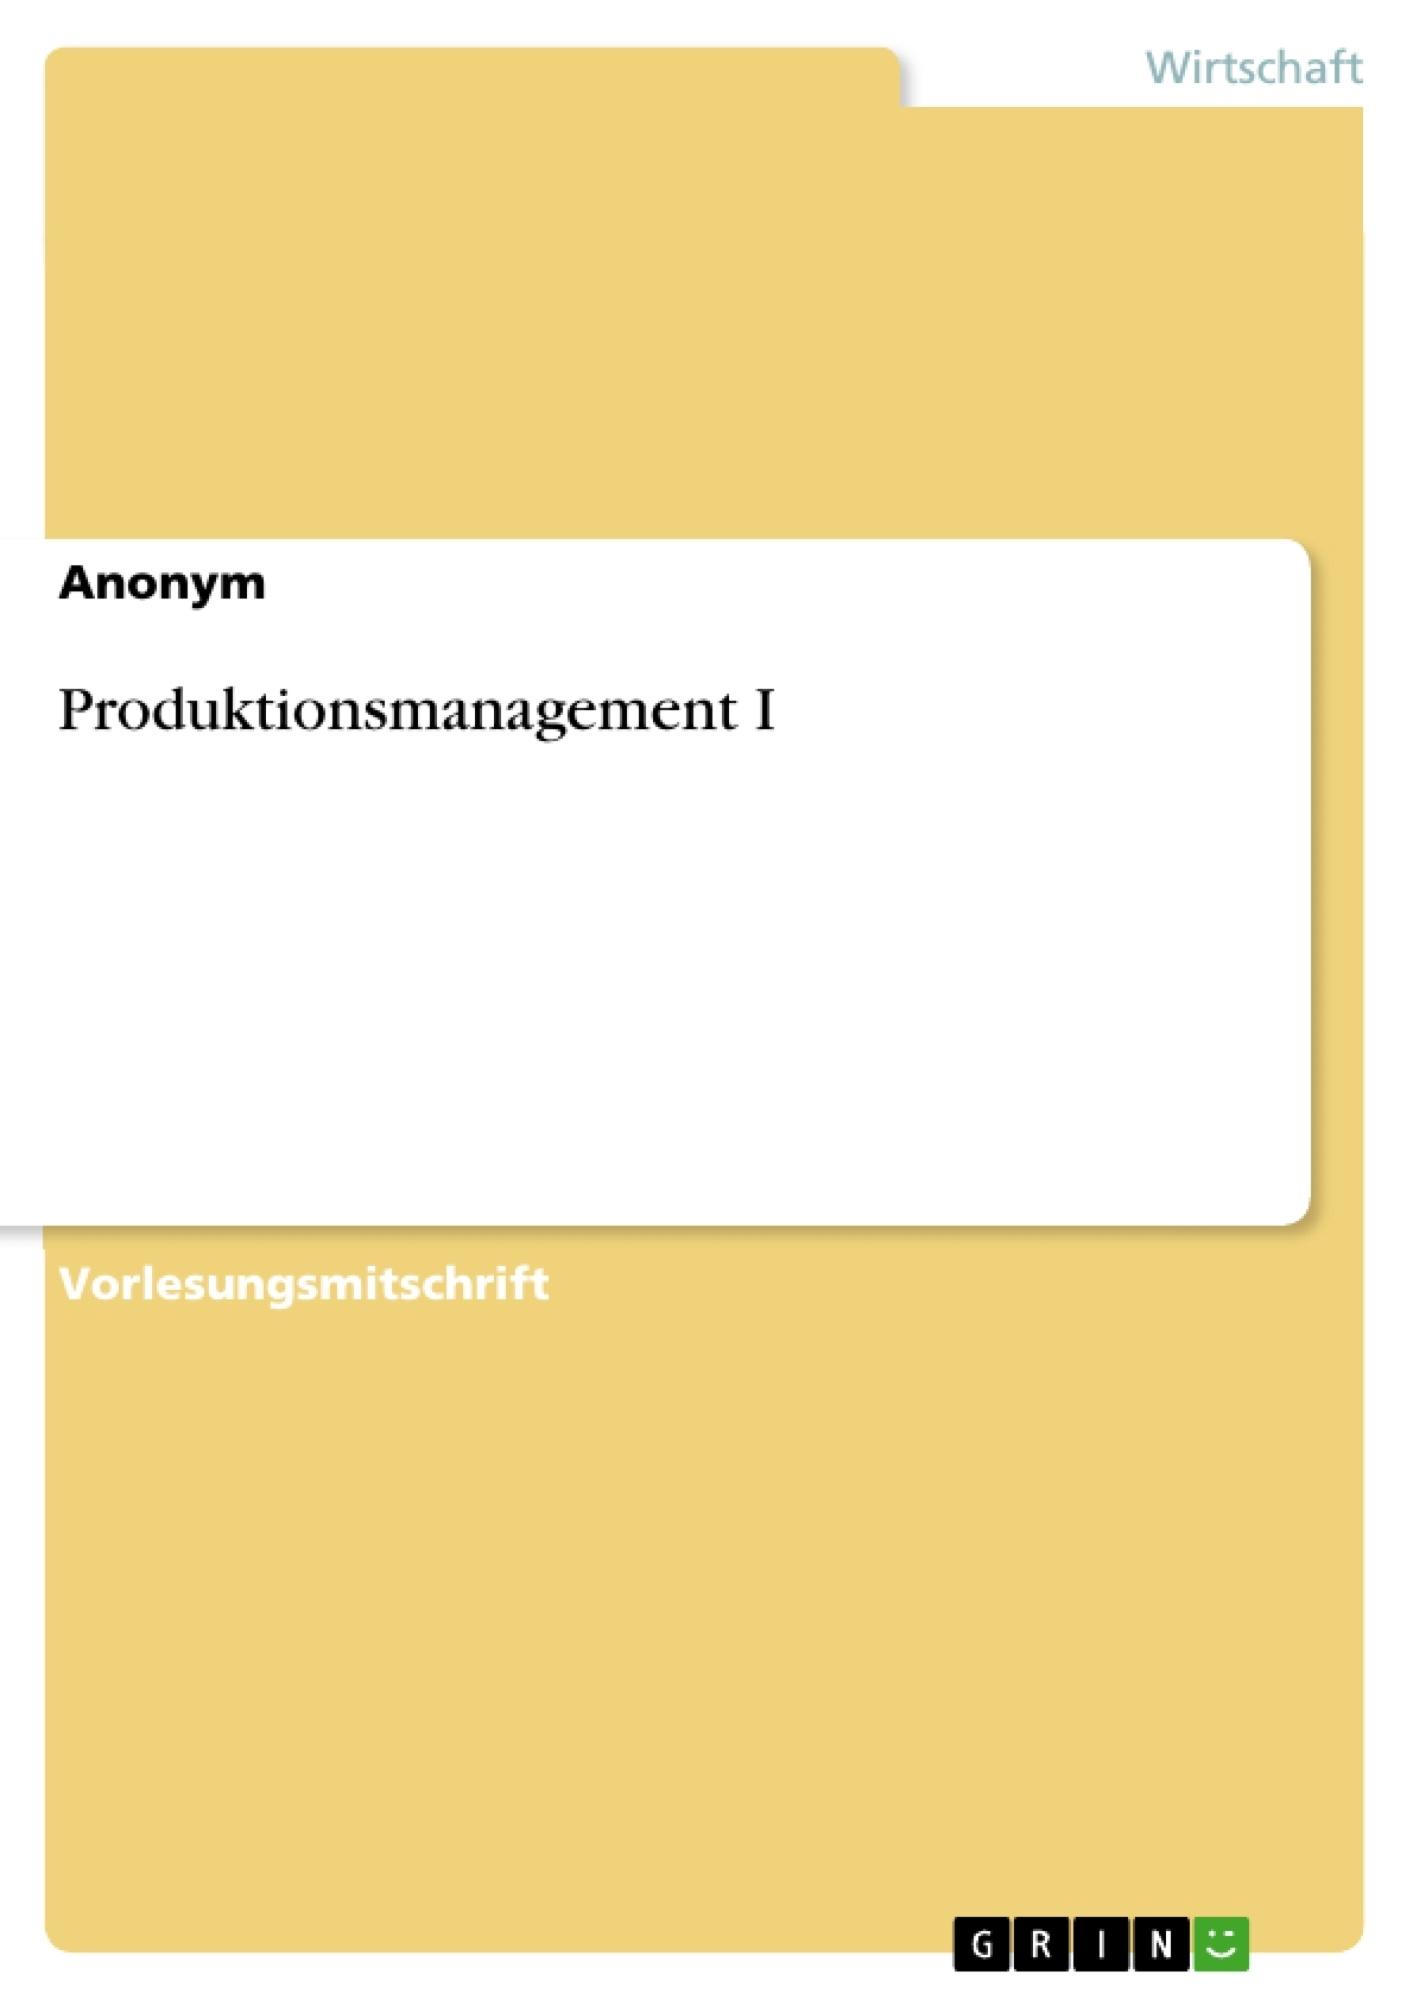 Titel: Produktionsmanagement I